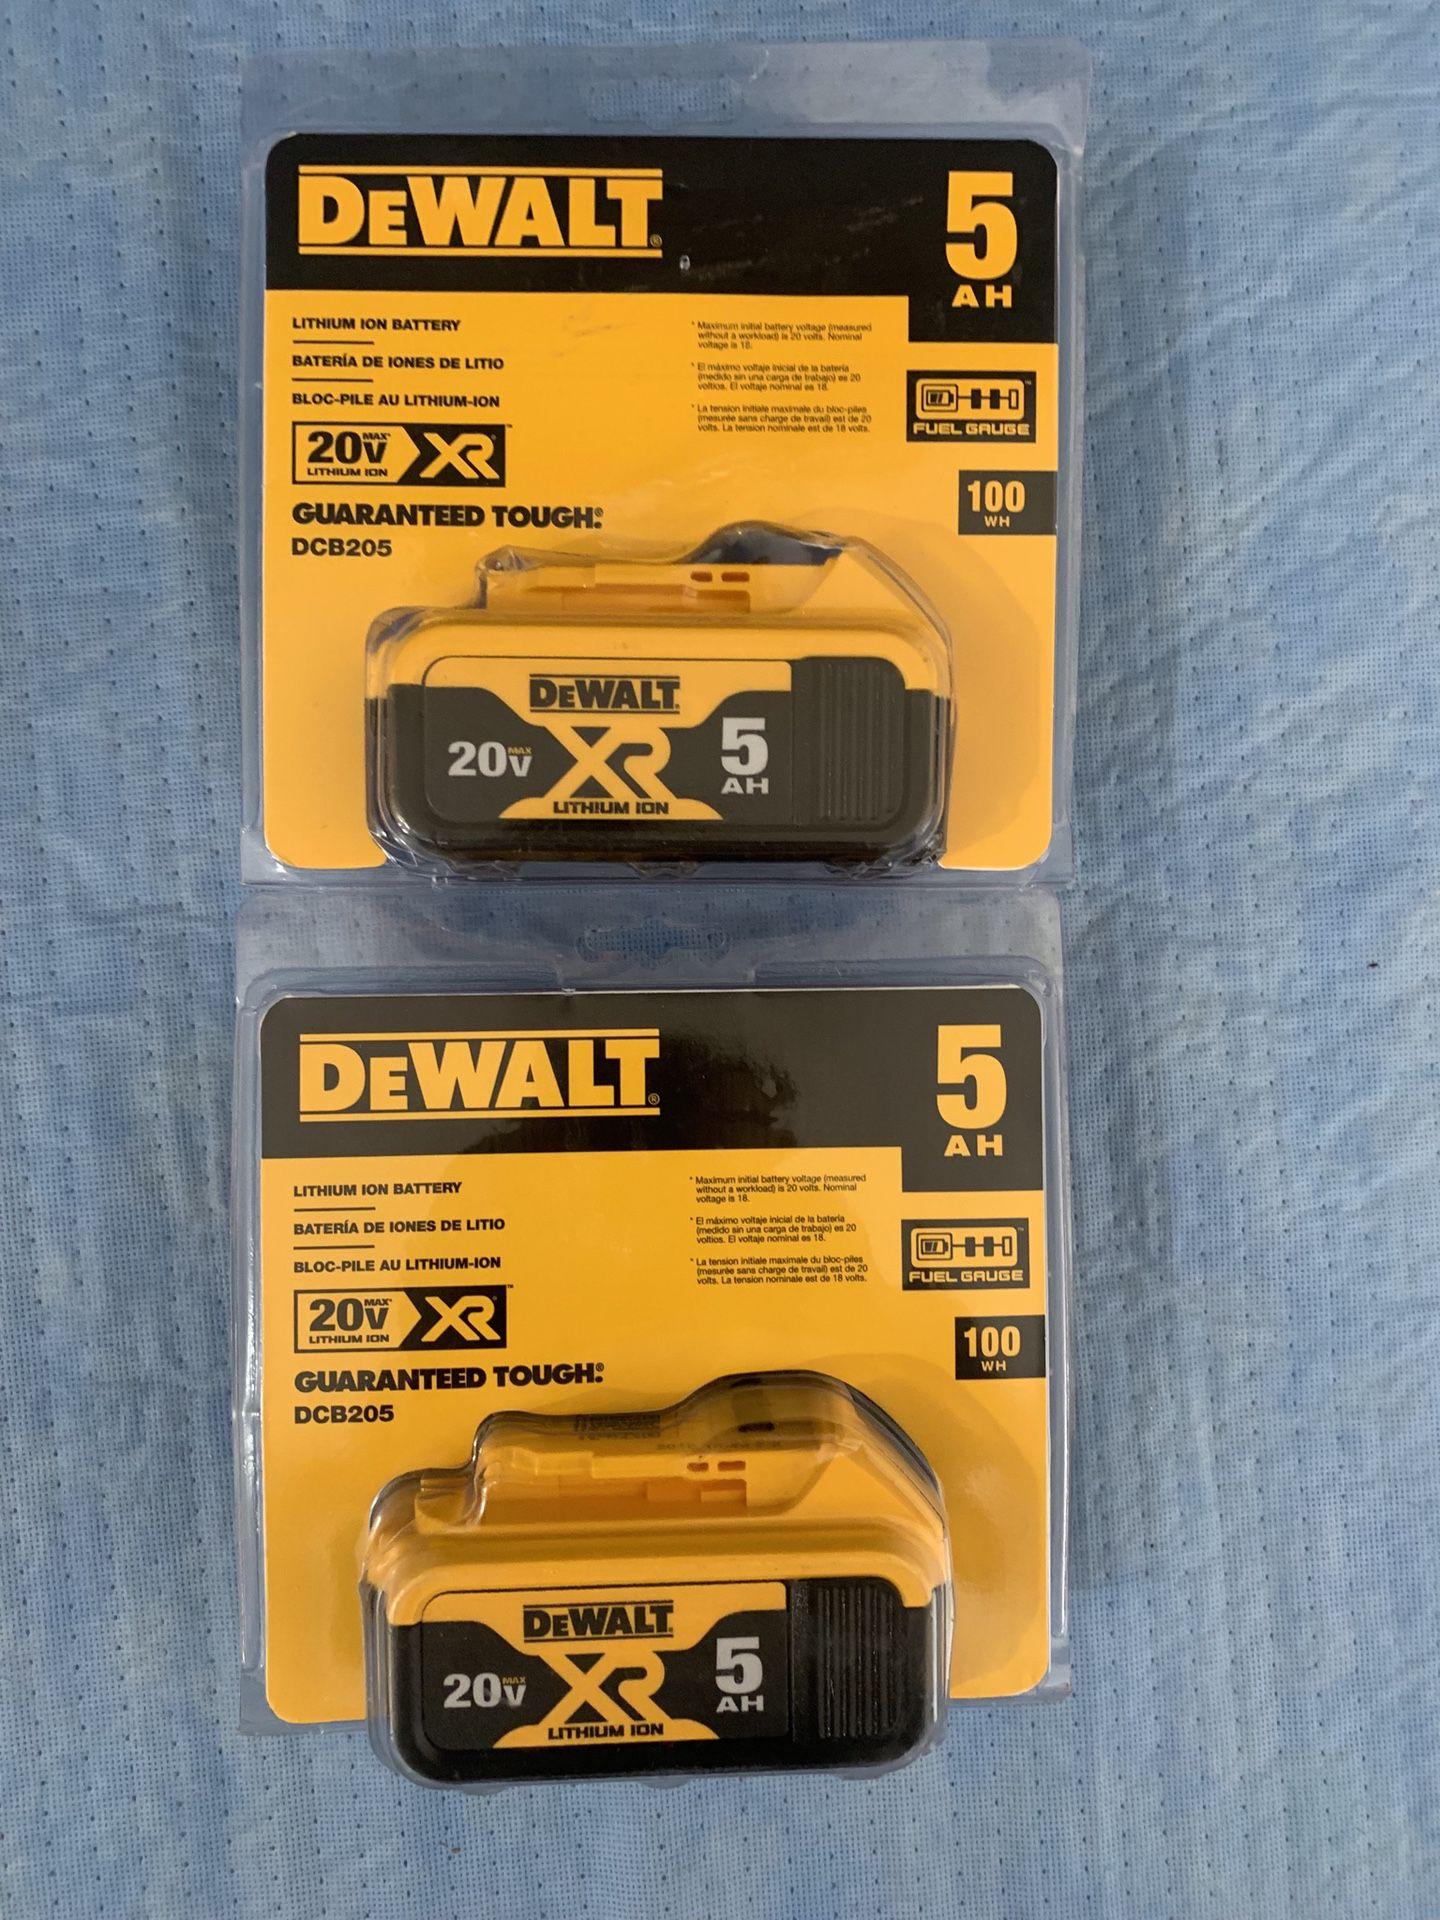 DEWALT 20-Volt MAX XR Lithium-Ion Premium Battery Pack 5.0Ah $55 Each ( 1 )